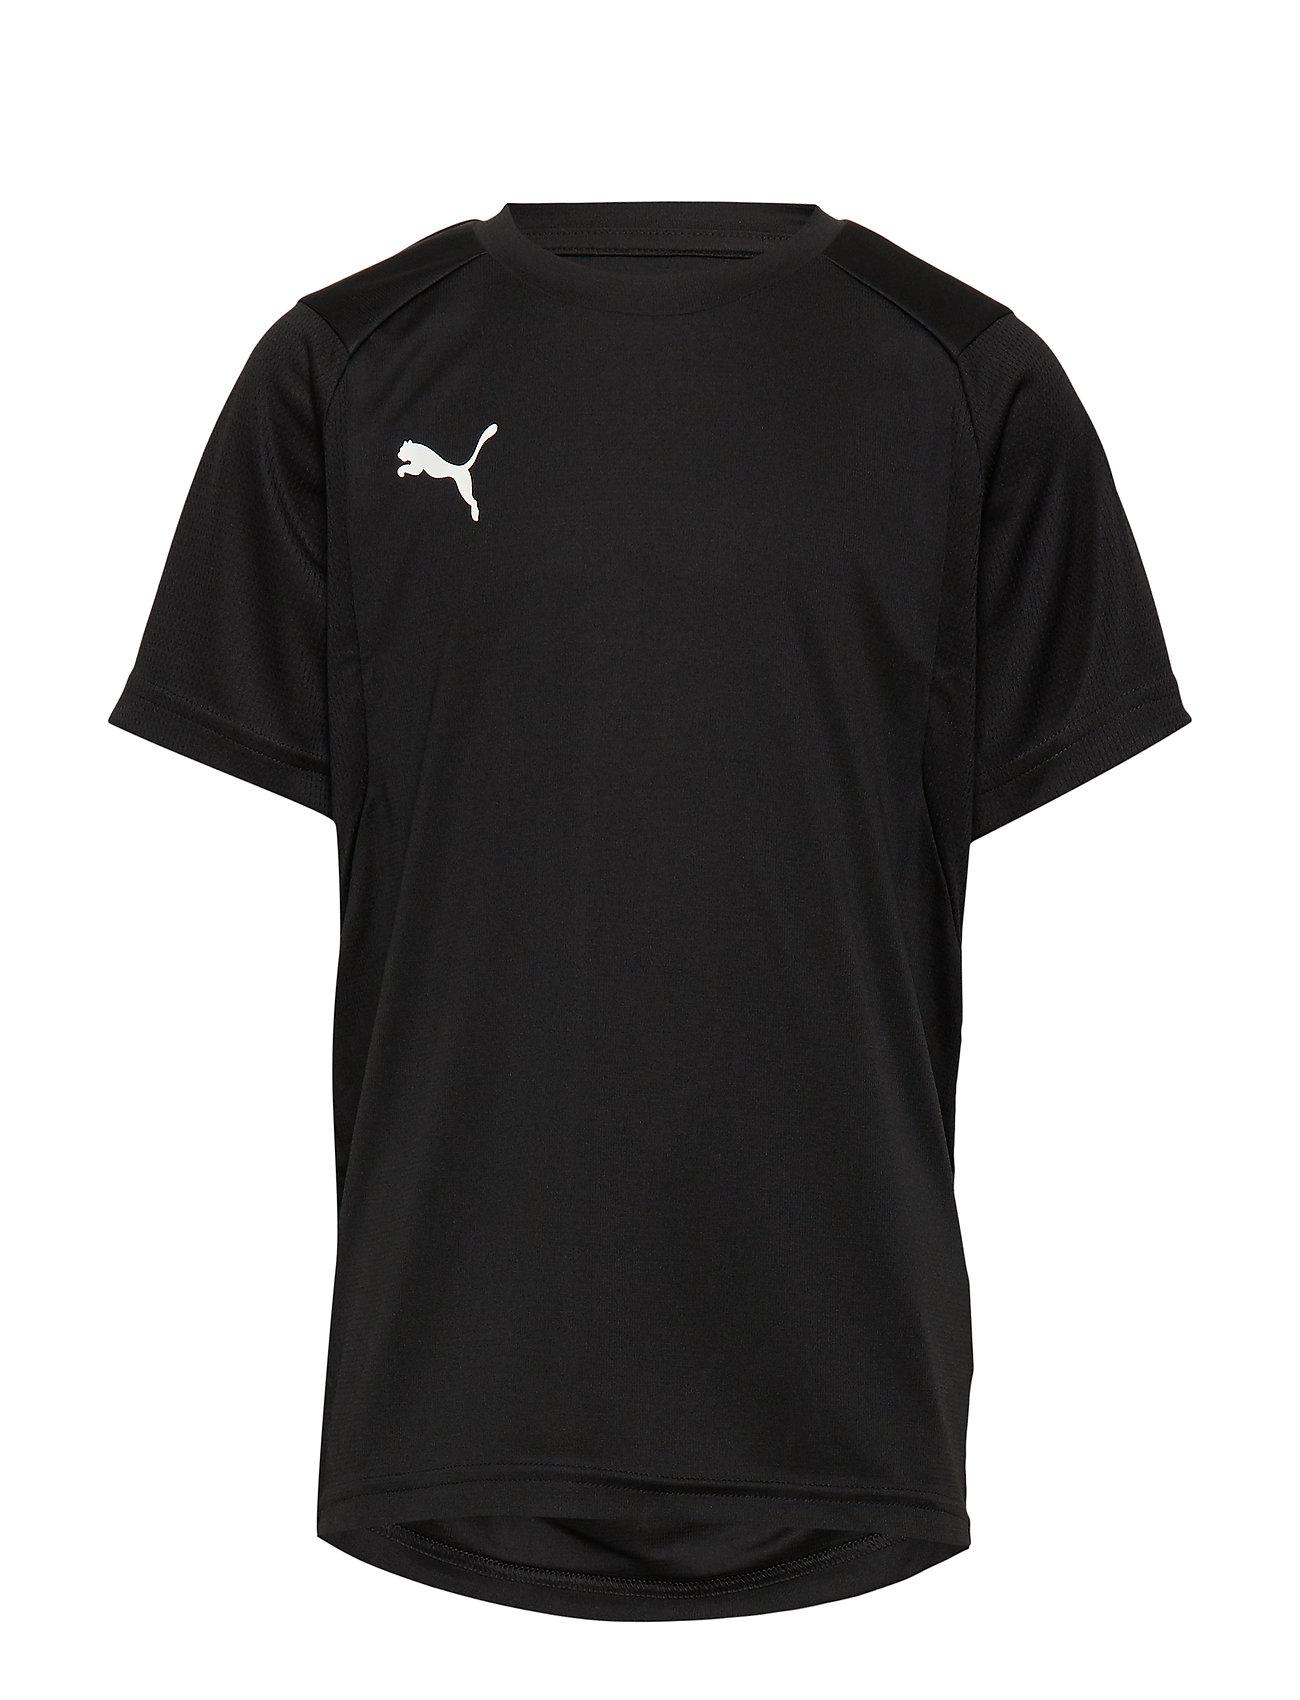 PUMA LIGA Training Jersey Jr - PUMA BLACK-PUMA WHITE